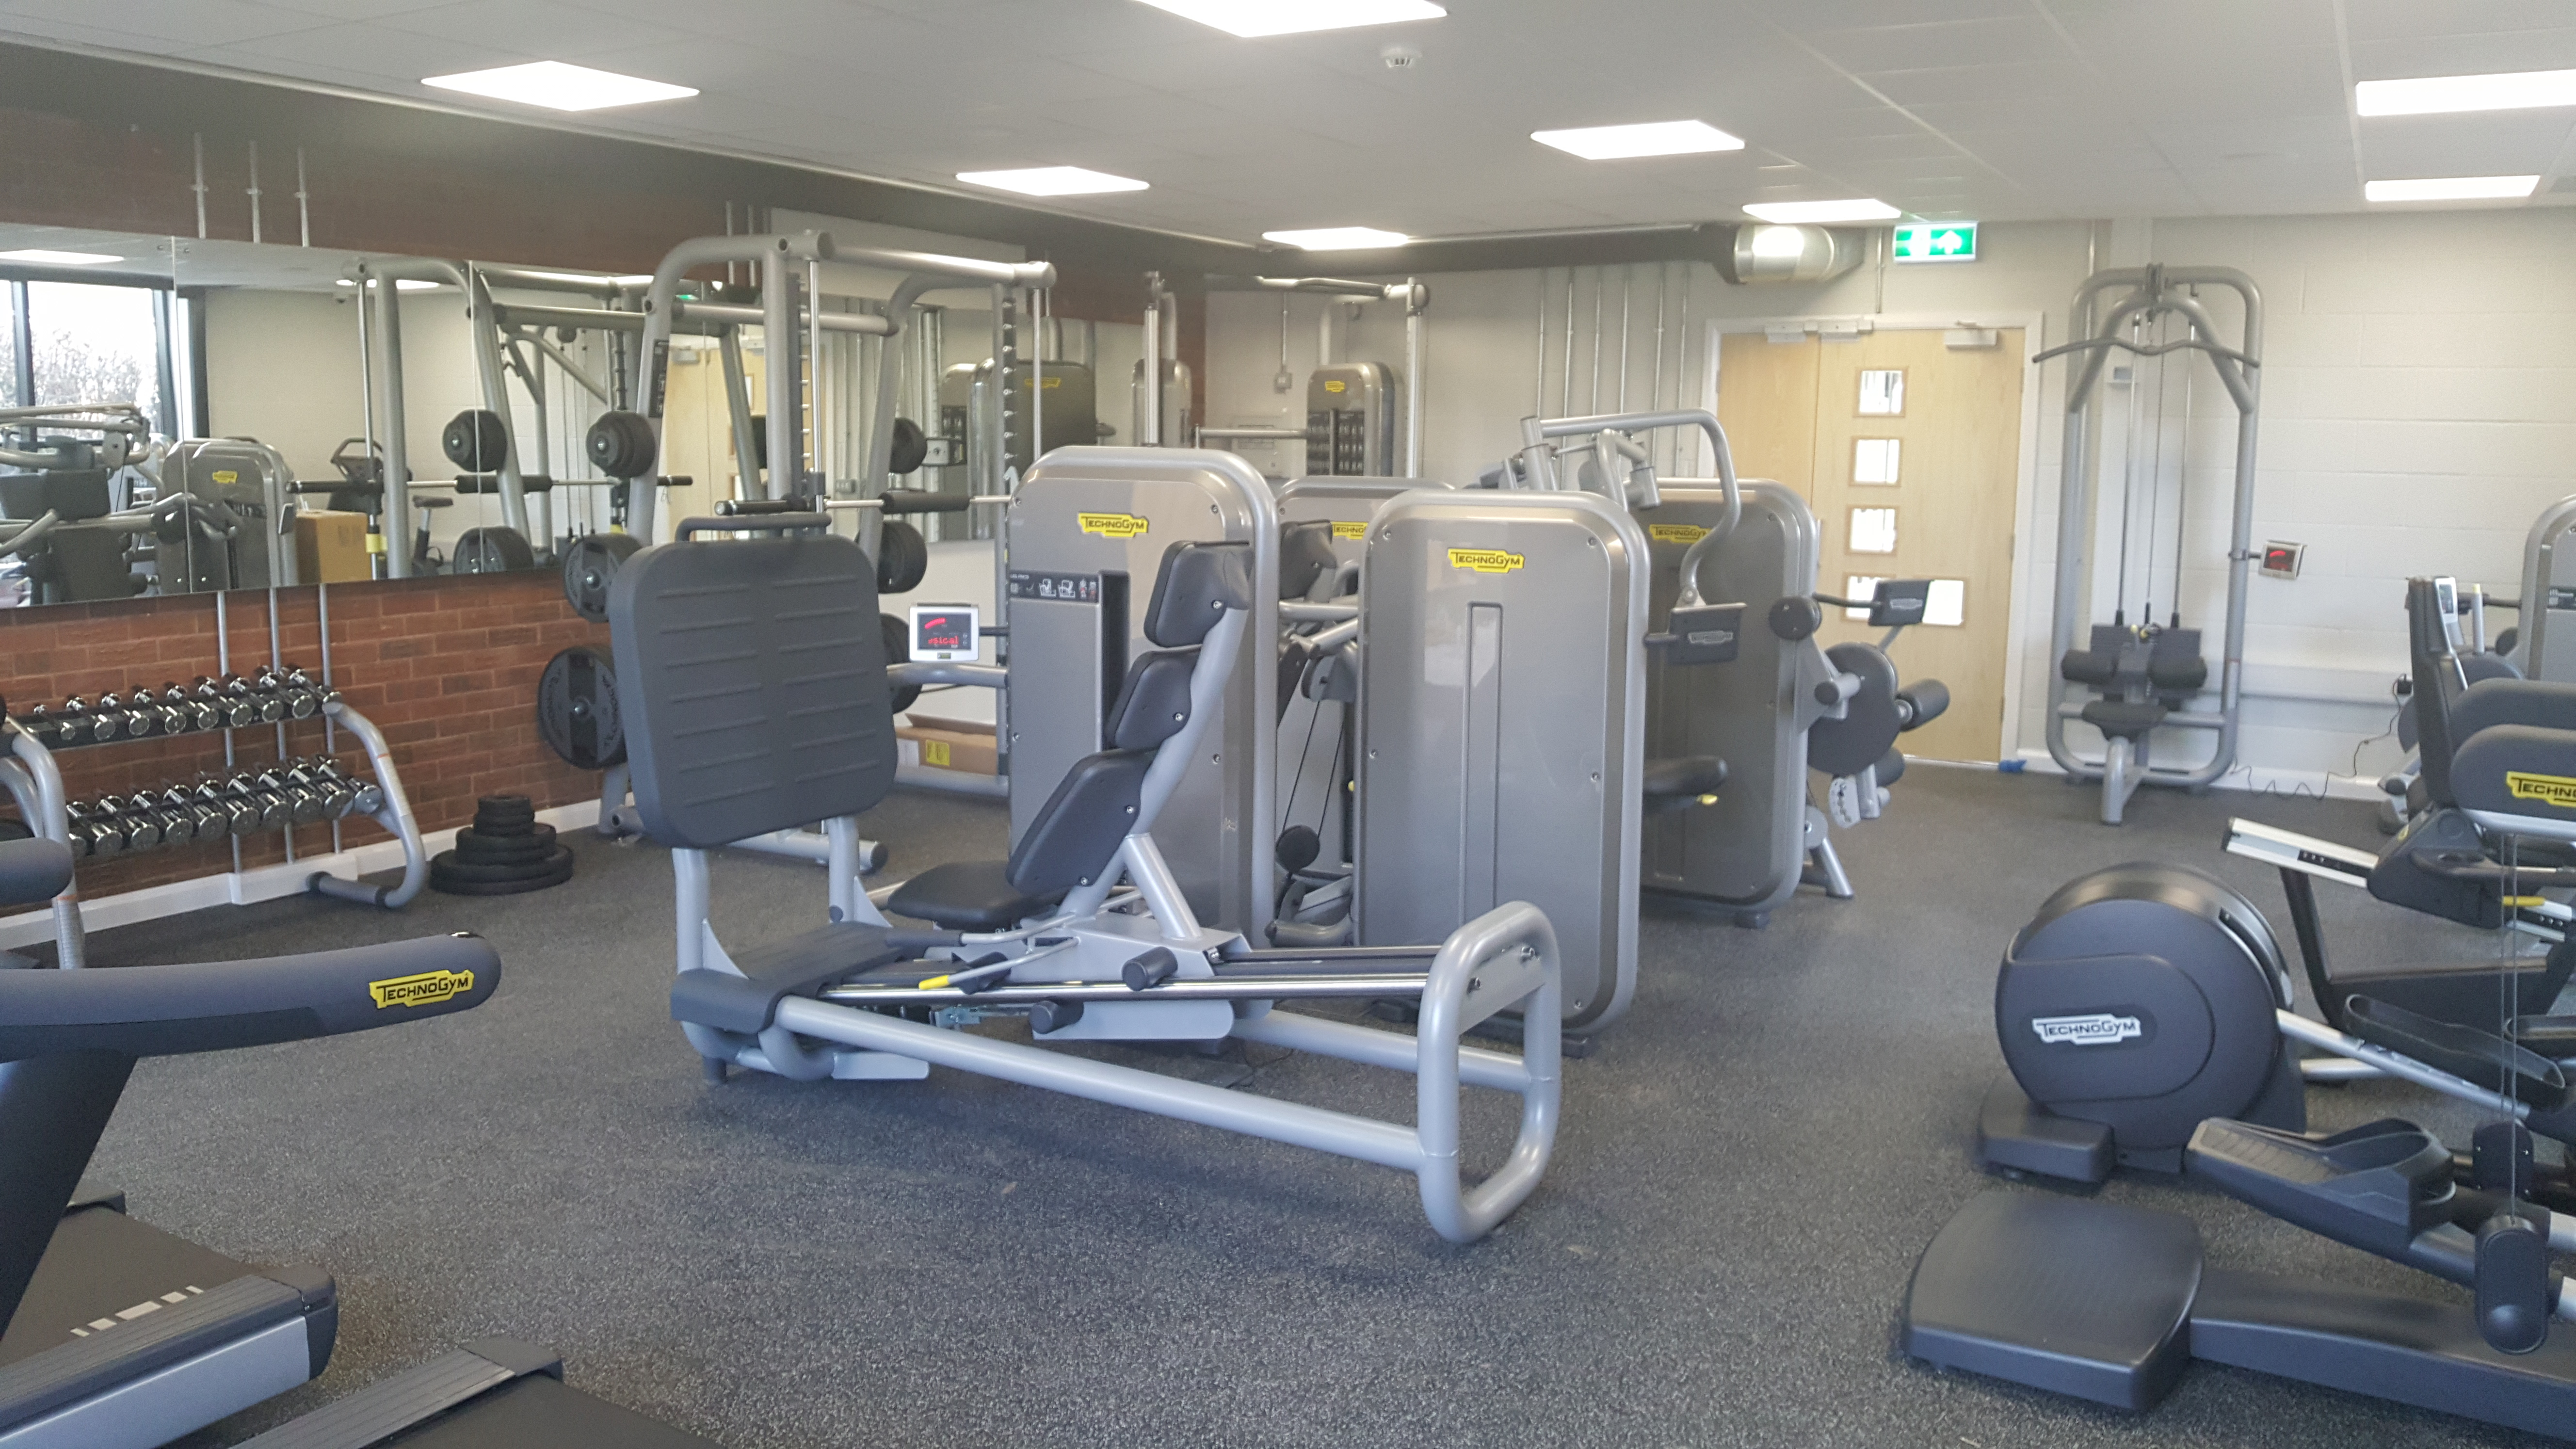 Duridge Bay Fitness Centre